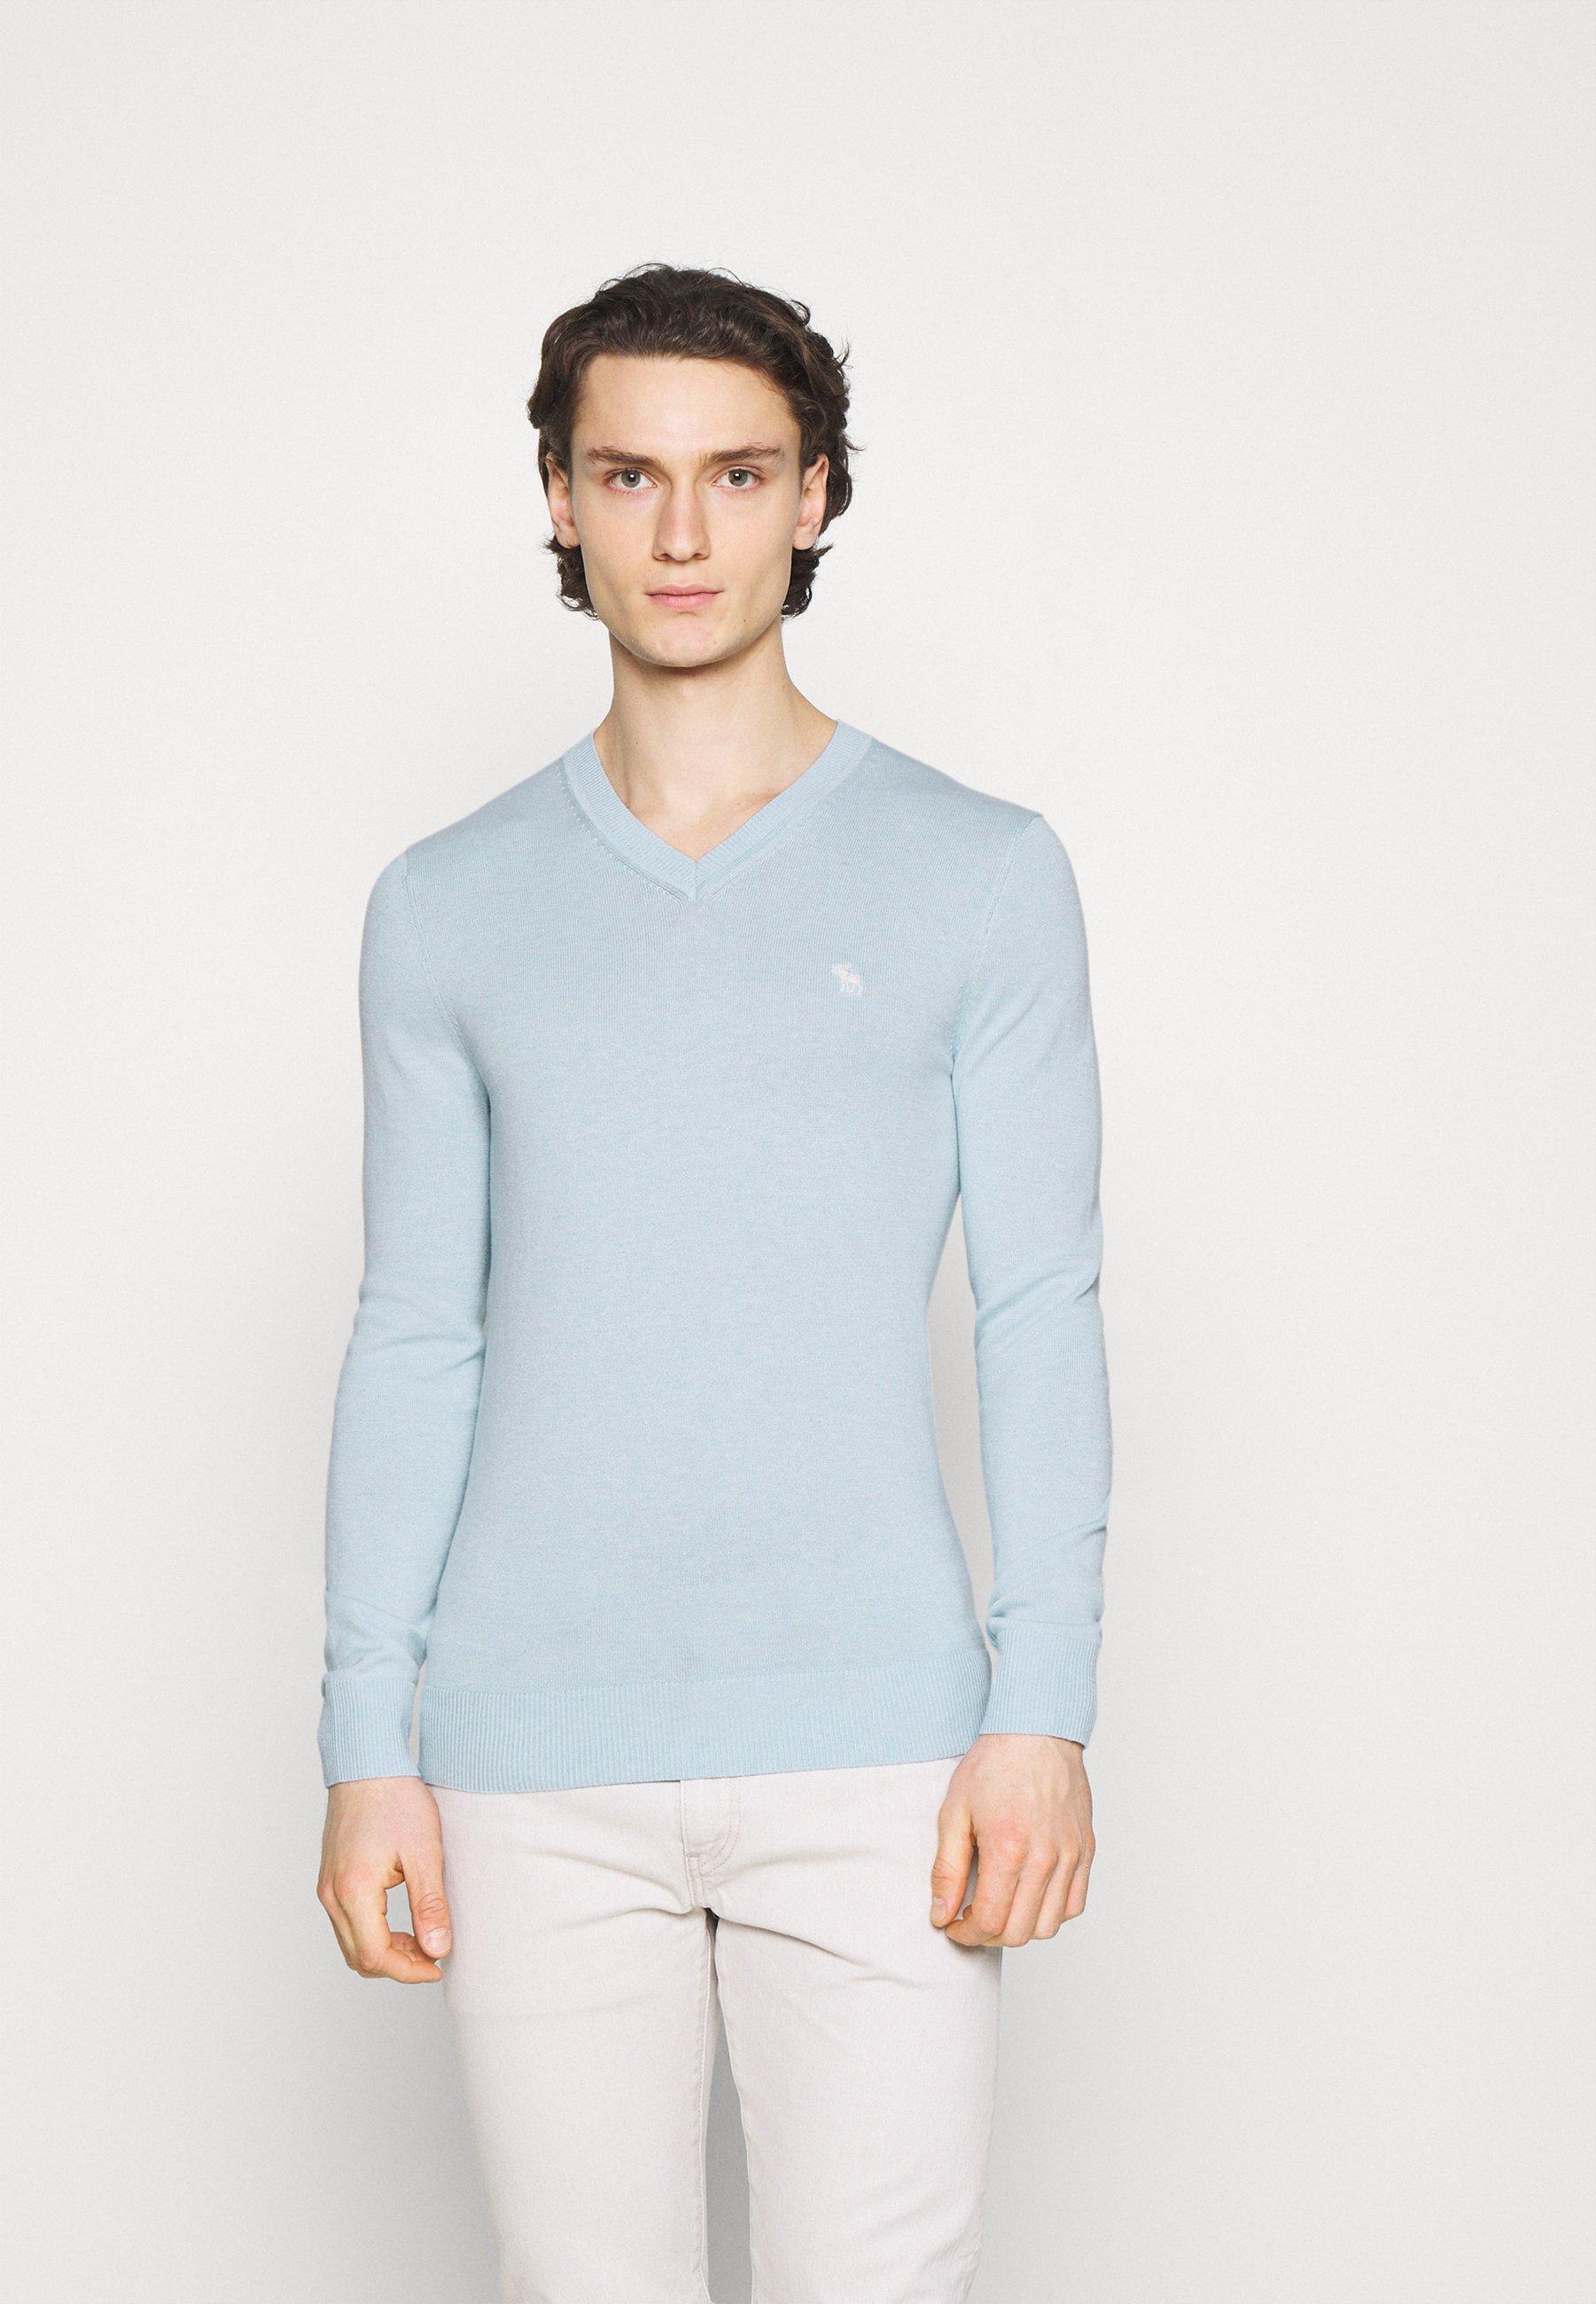 Homme ICON V NECK - Pullover